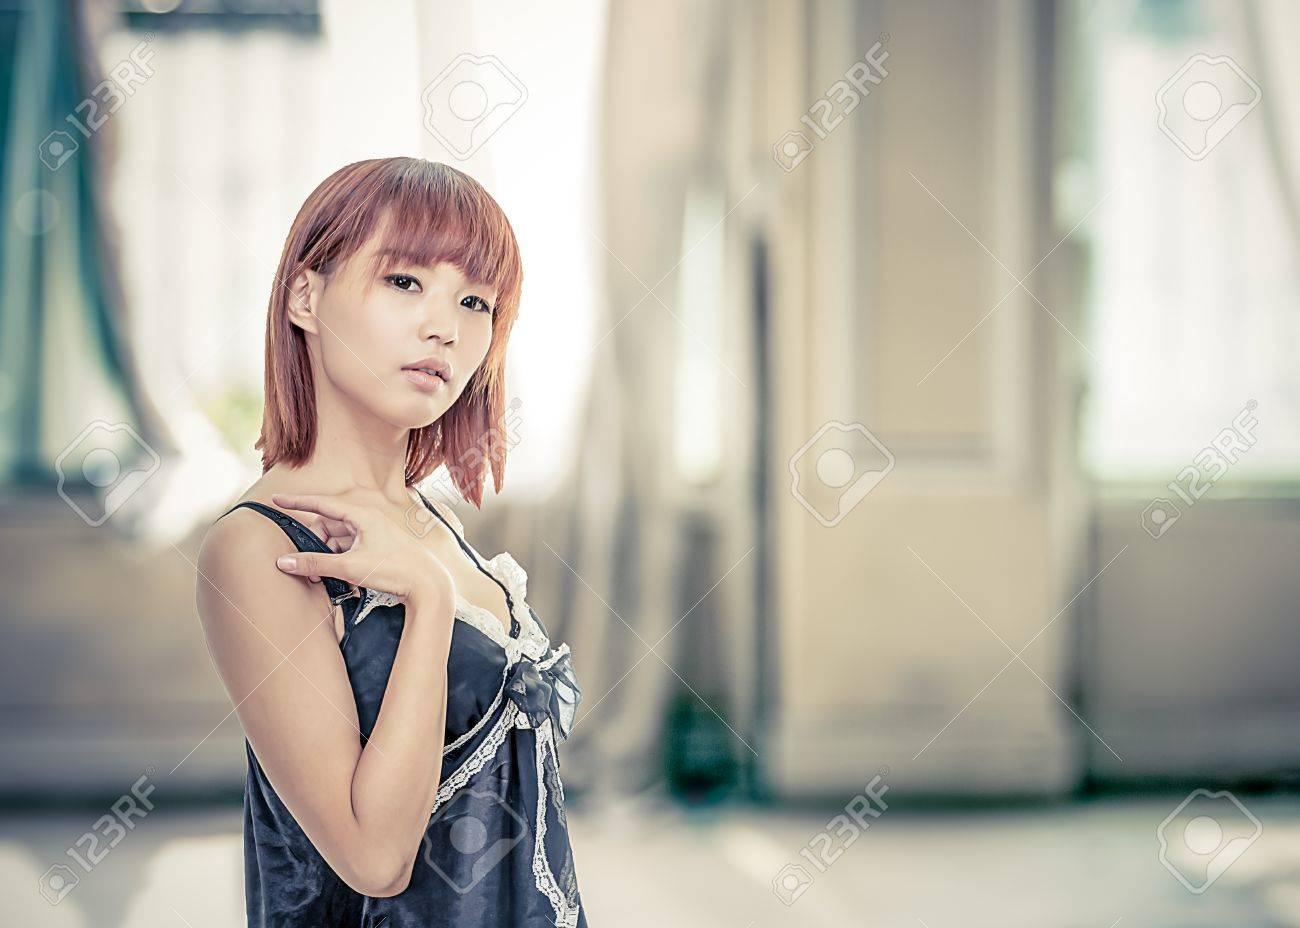 Taiwanese chinese female wearing lingerie Stock Photo - 26749830